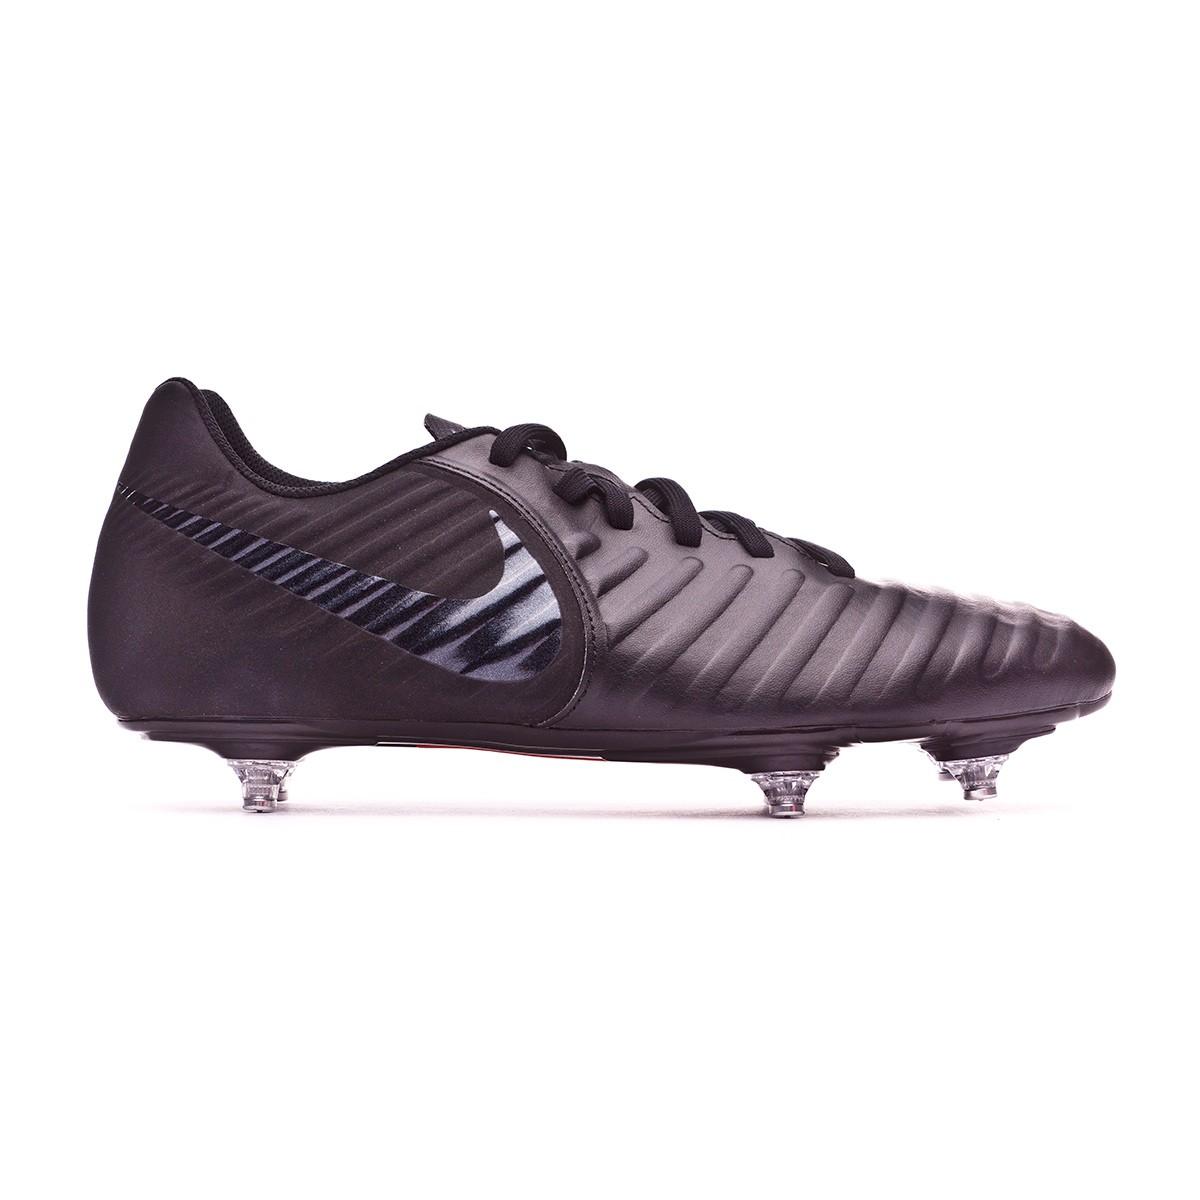 Bota de fútbol Nike Tiempo Legend VII Club SG Black - Leaked soccer ca60cfc3ef4b4